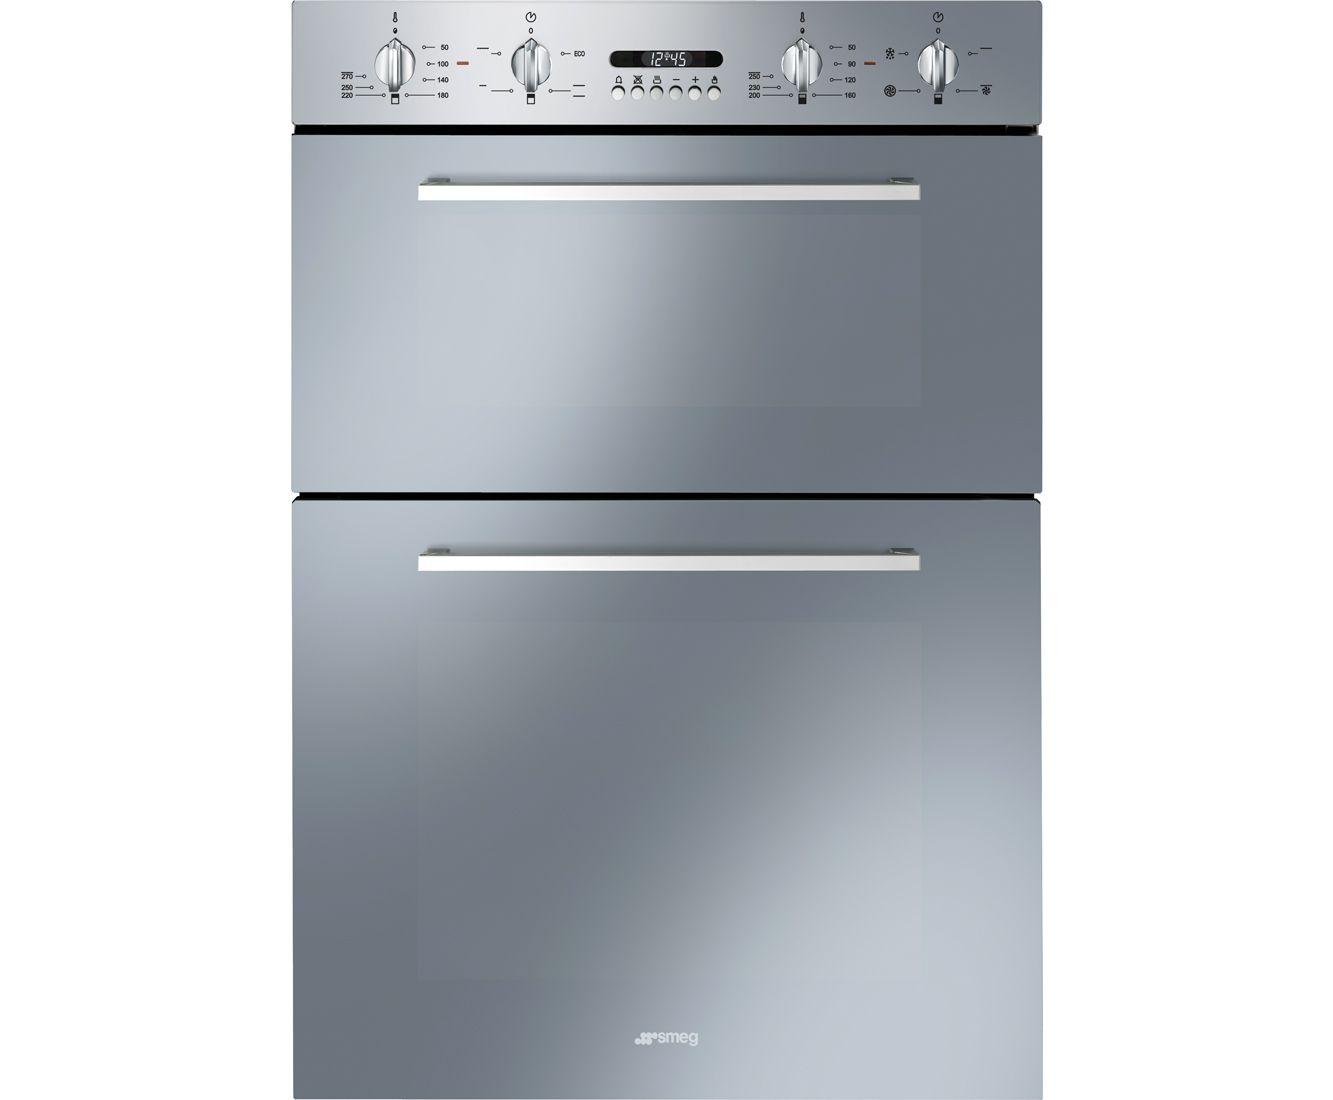 Smeg Cucina Built-In Electric Double Oven | DOSF44X | ao.com | new ...